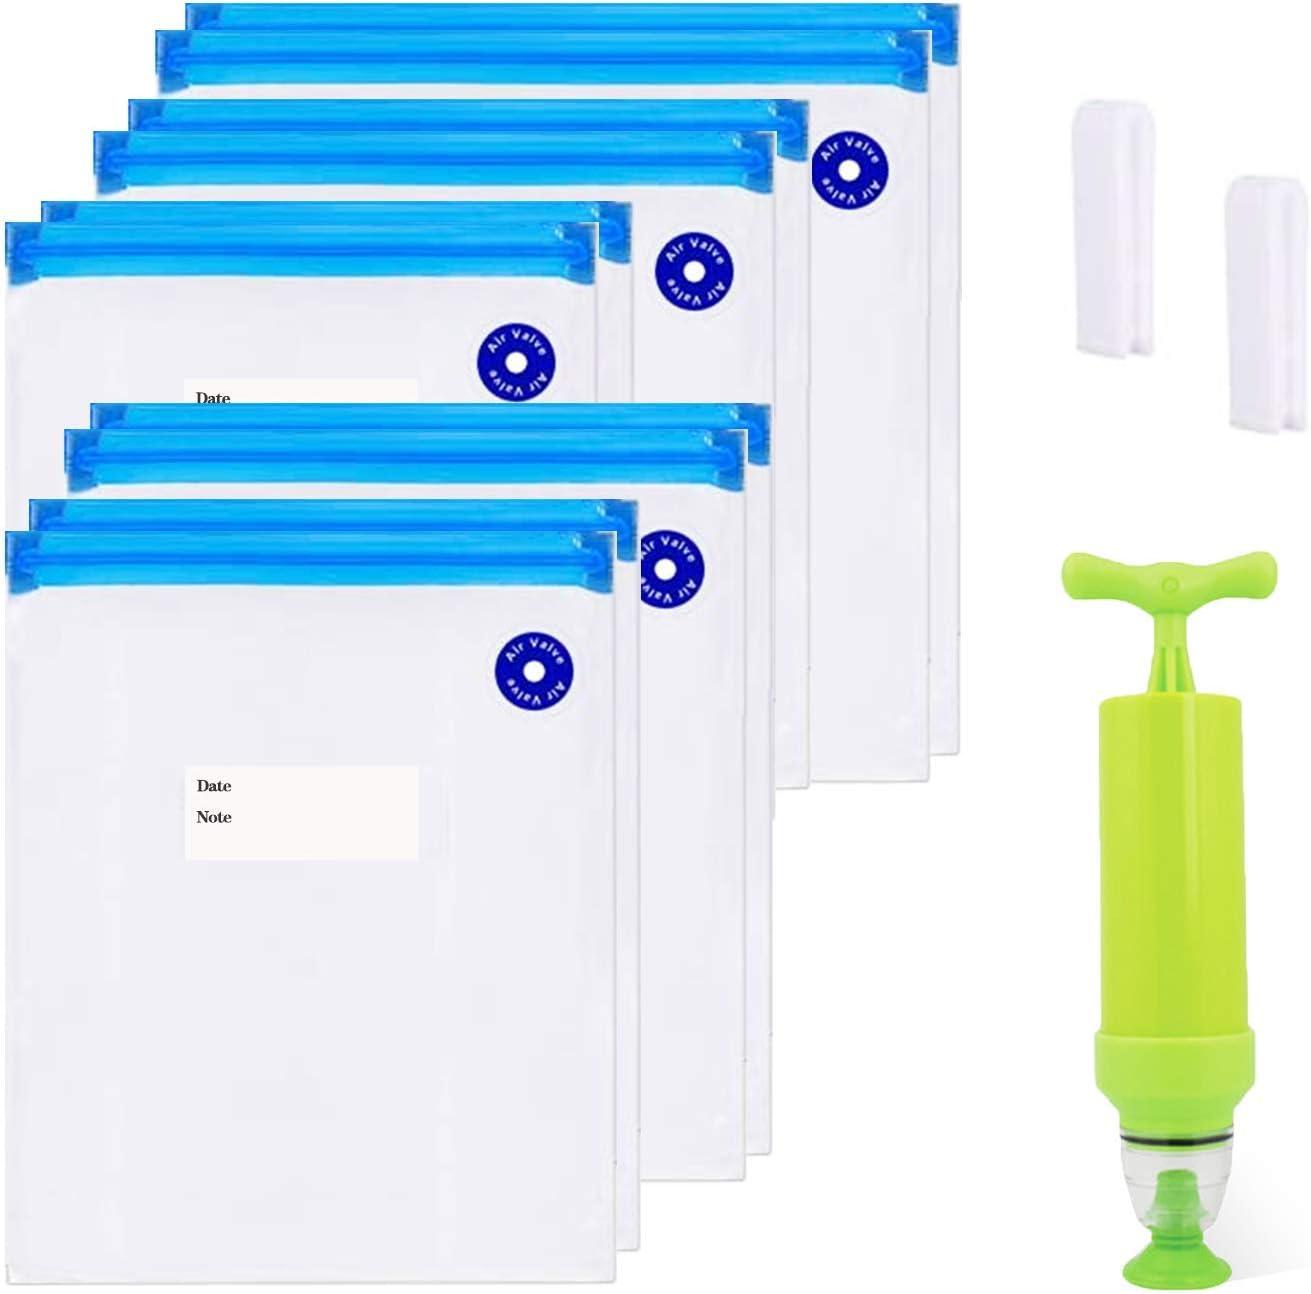 Vacuum Sealer & 10 PCS Reusable Vacuum Food Storage Bags, Reusable Vacuum Sealer Bags, Vacuum Sealer Set for food preservation